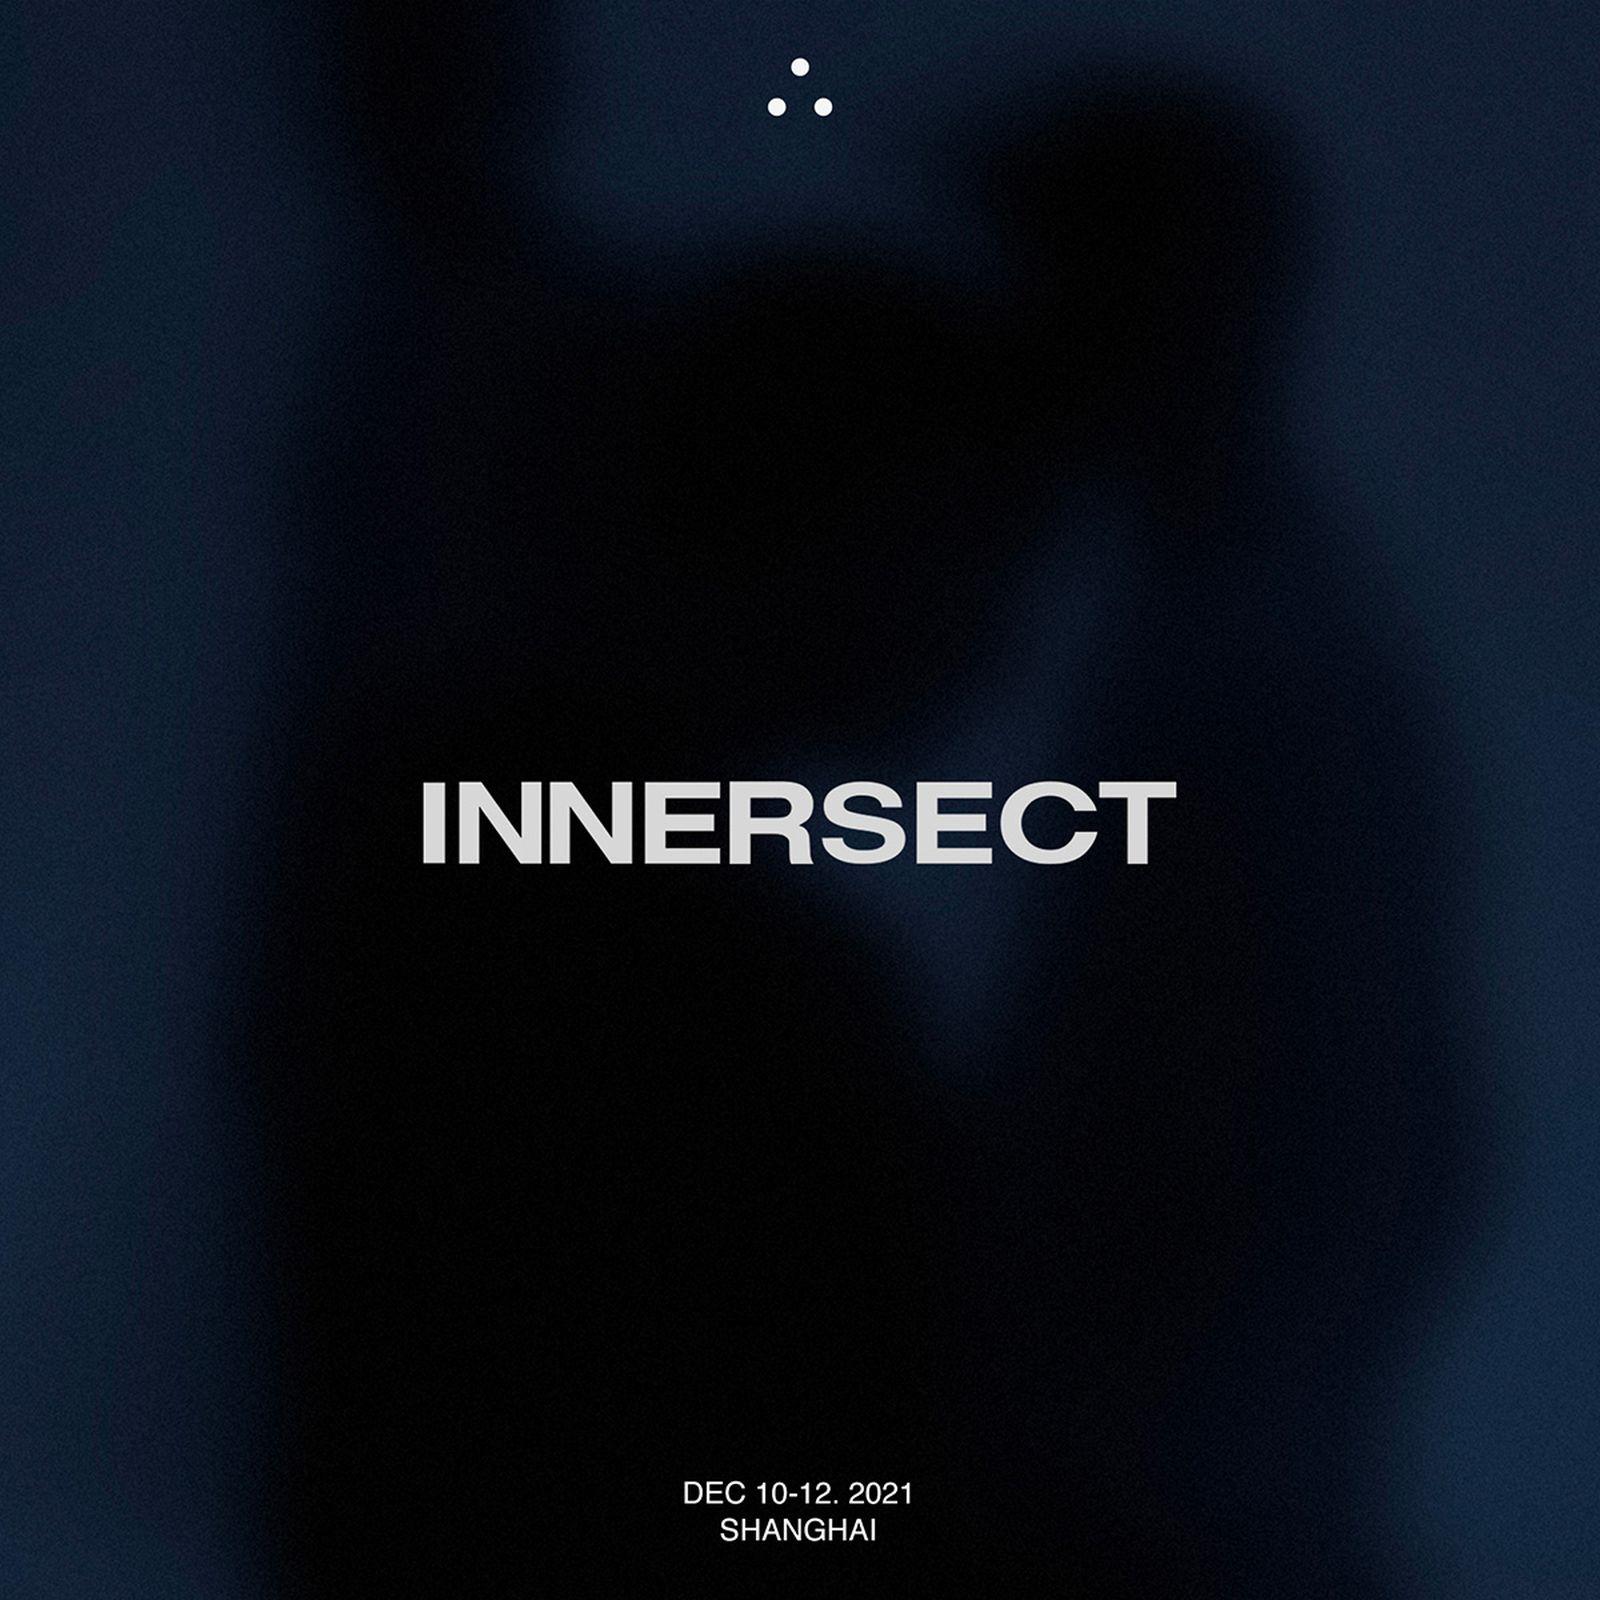 innersect-2021-jerry-lorenzo-6